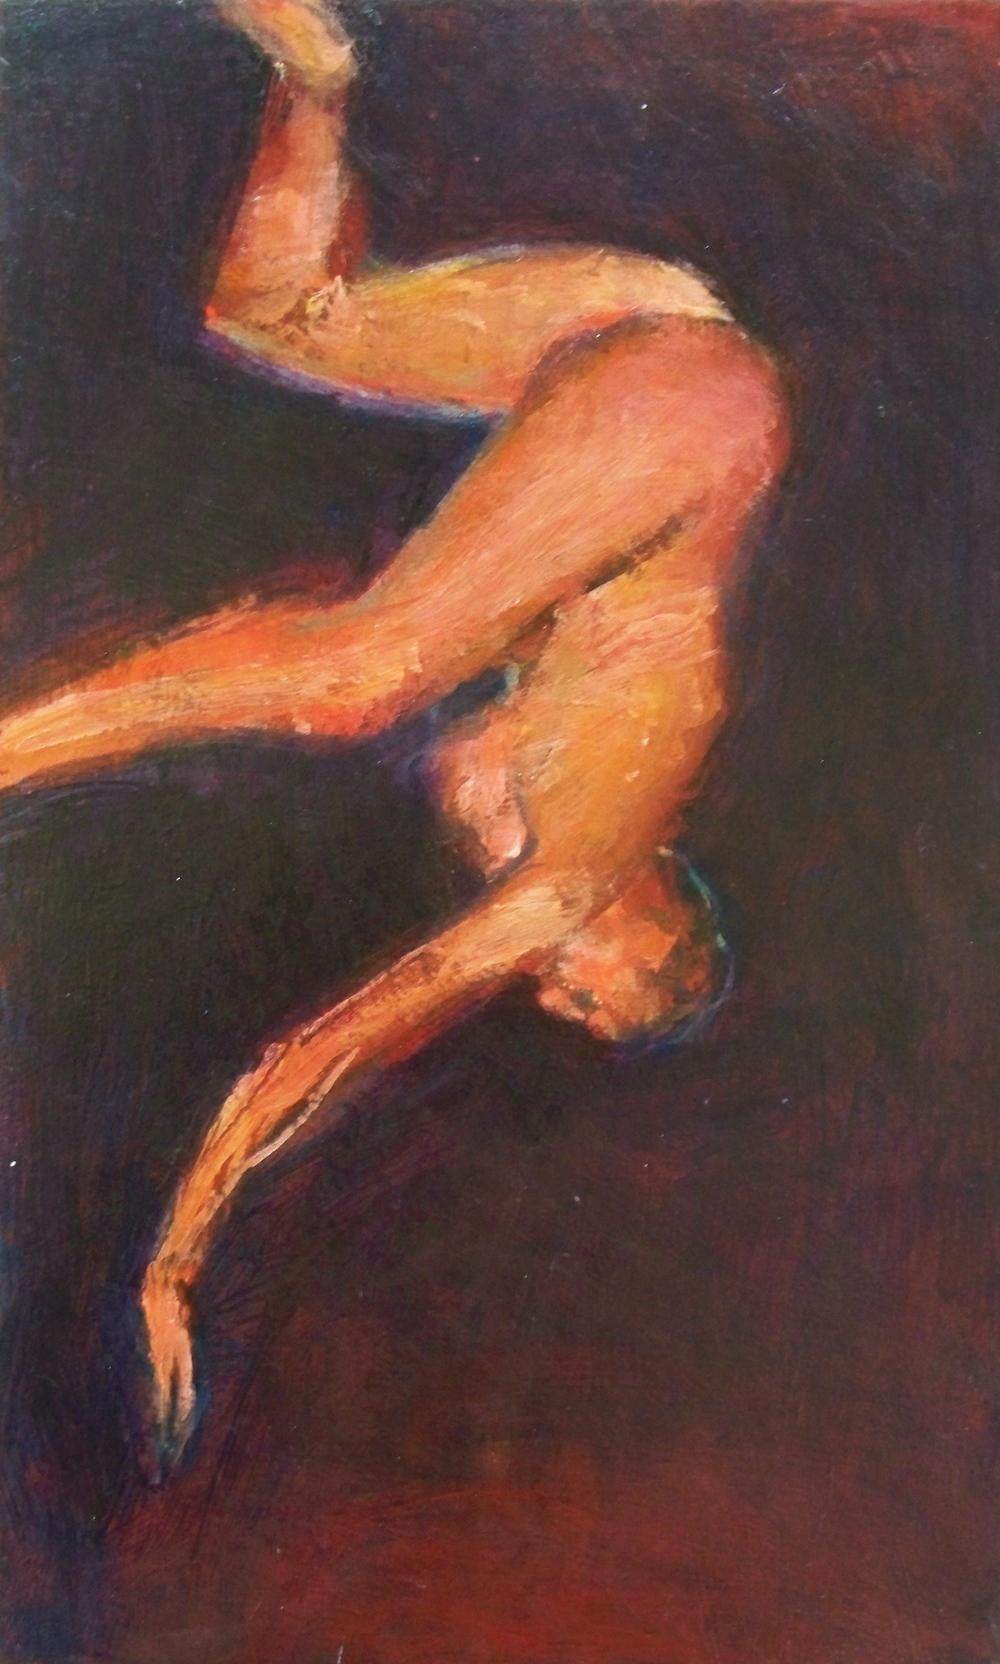 falling figure 4